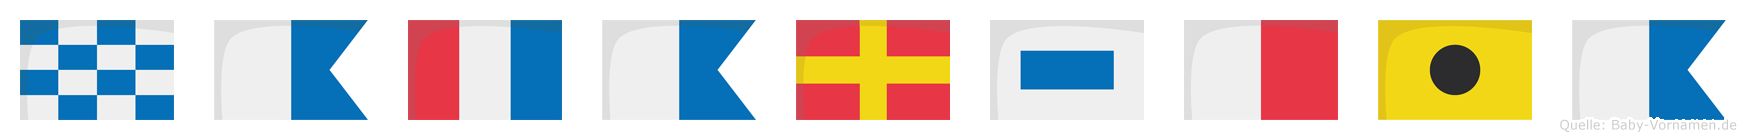 Natarshia im Flaggenalphabet